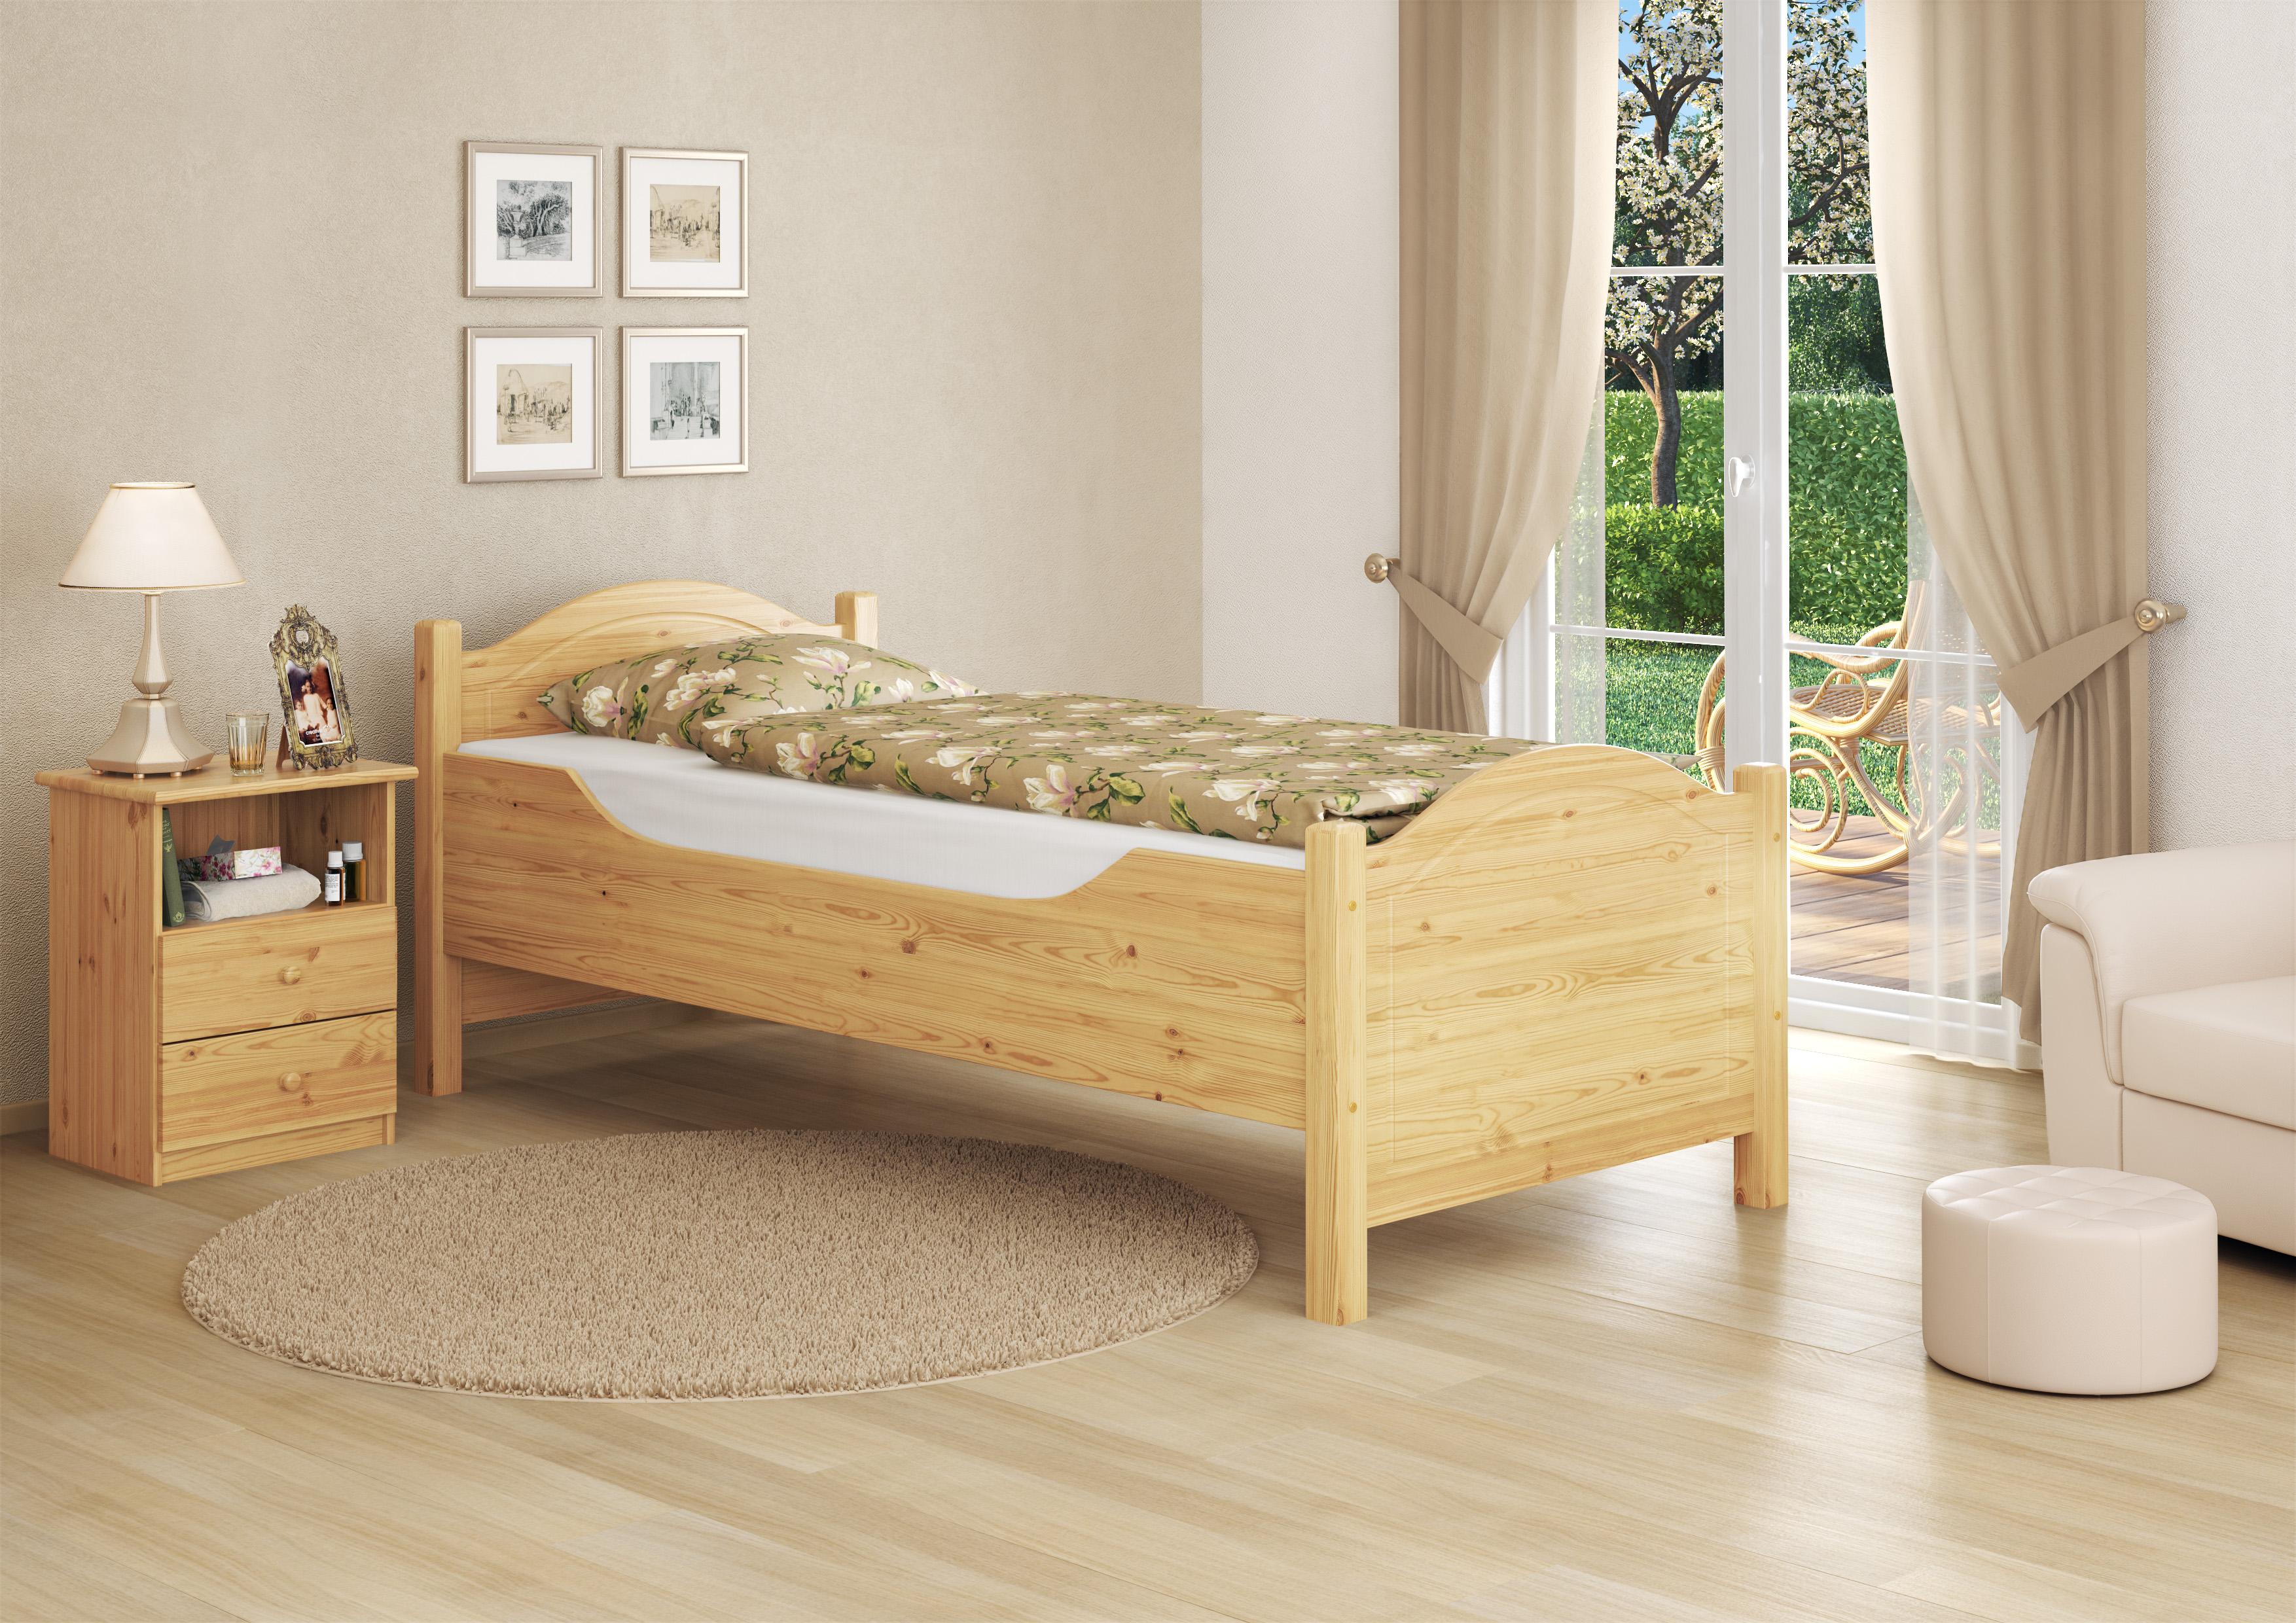 Senior beds